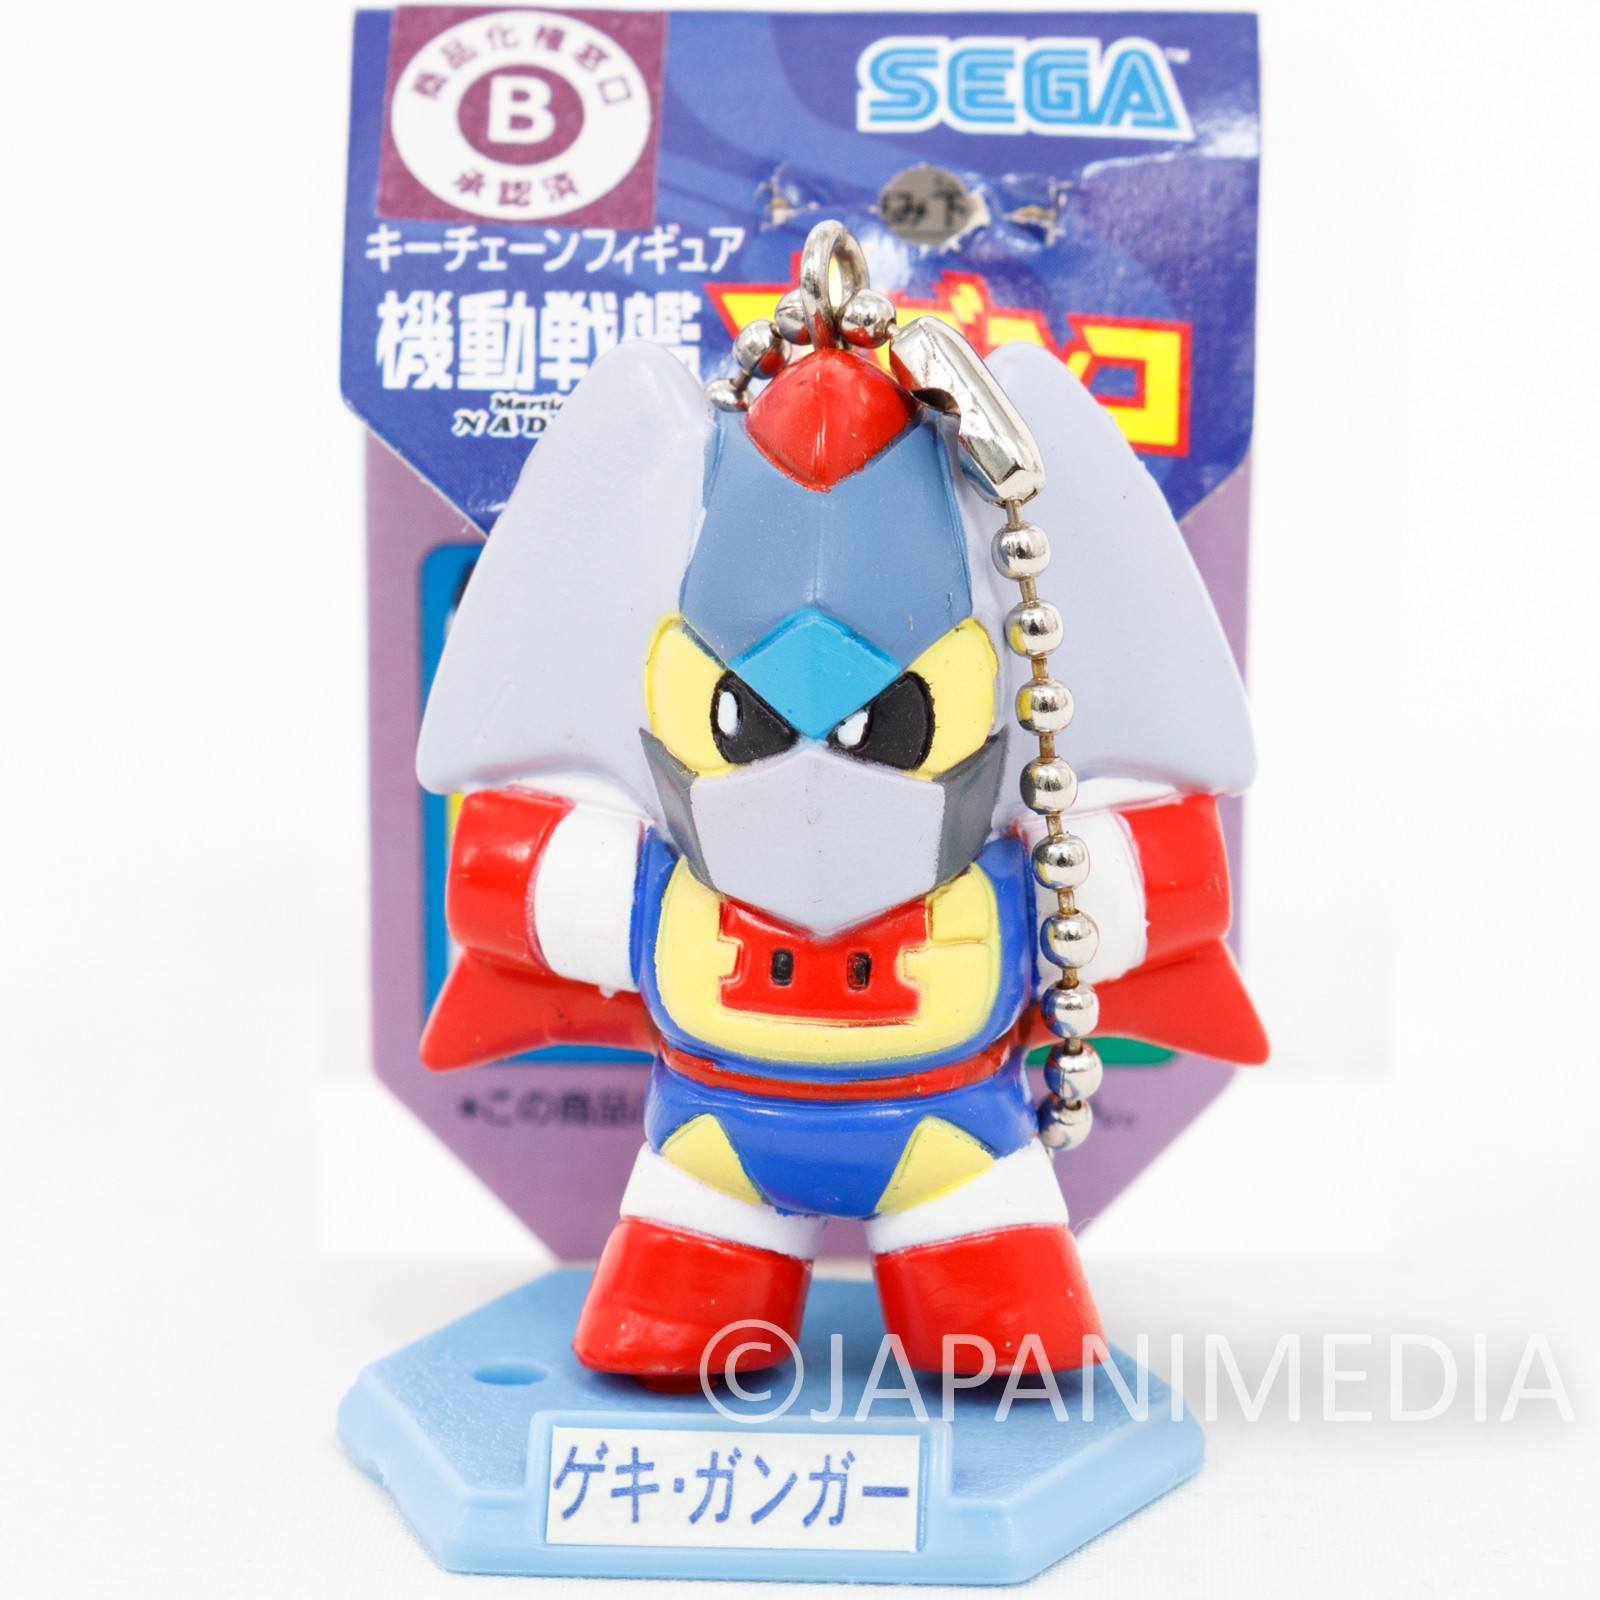 Martian Successor NADESICO Gekigangar Figure Ballchain JAPAN ANIME